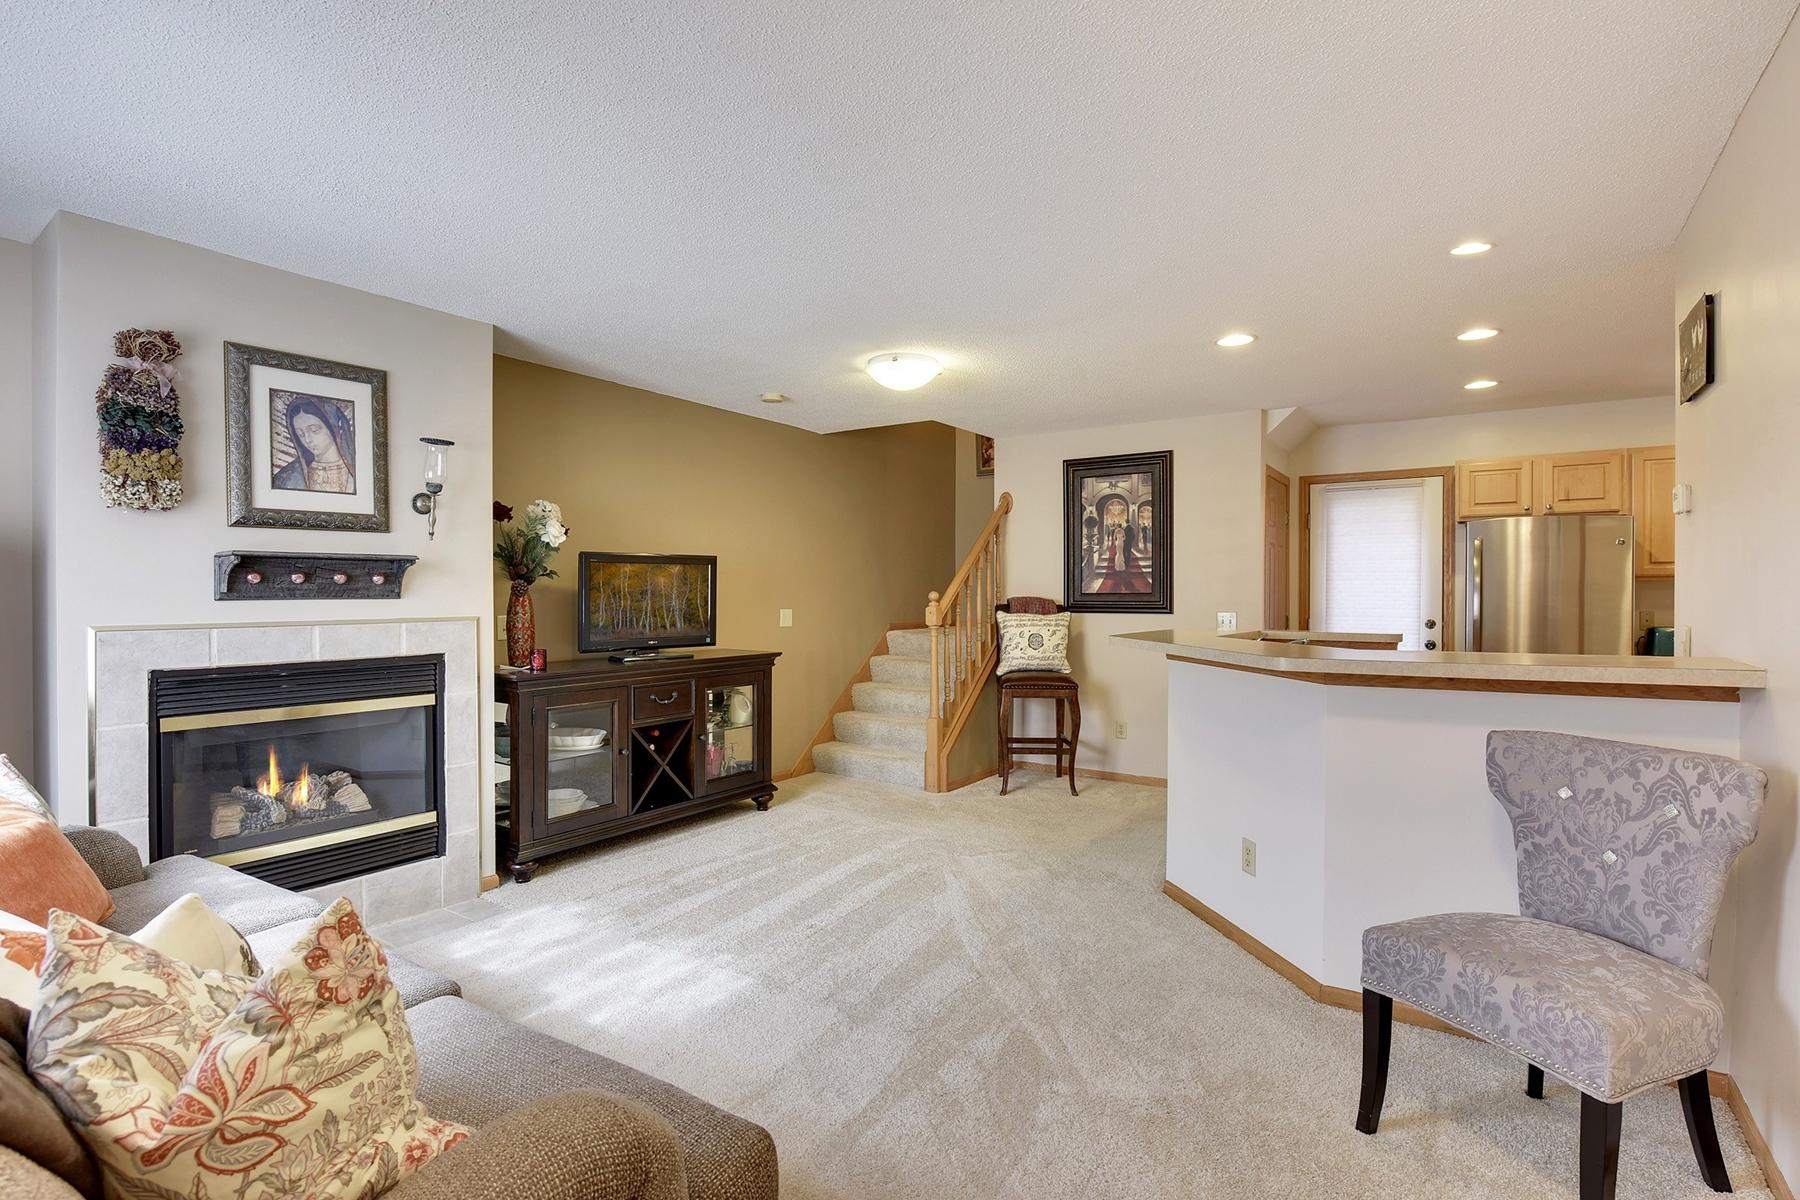 Townhouse for Sale at 280 Sunnyridge Lane Loretto, Minnesota, 55357 United States